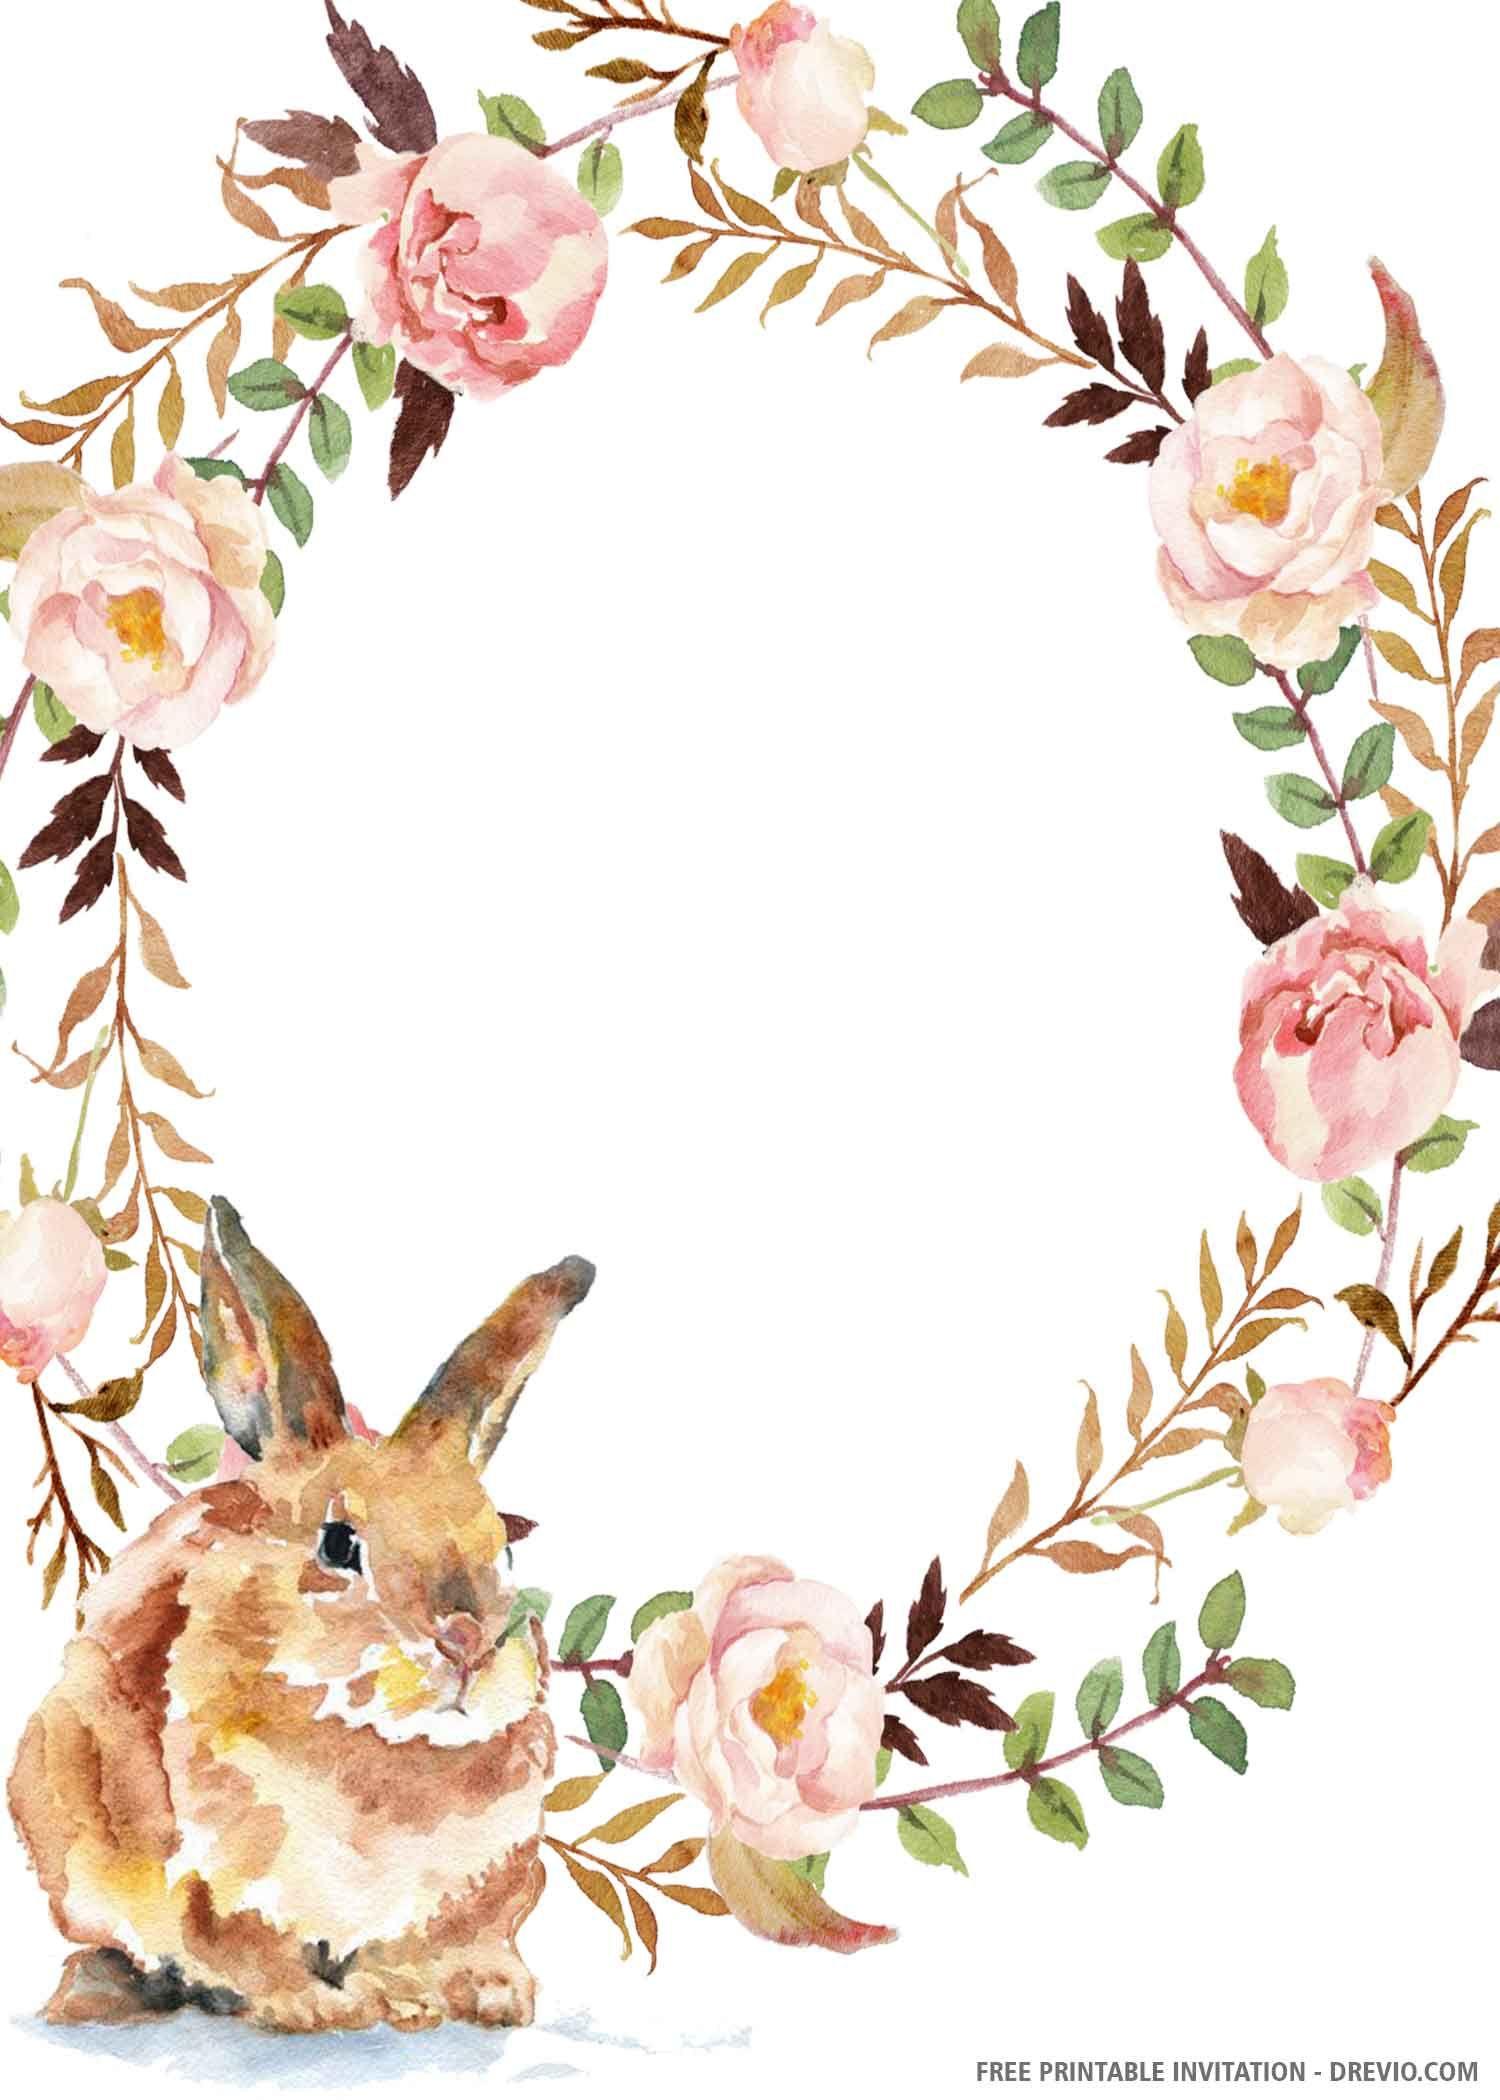 (FREE PRINTABLE) – Cute Bunny Birthday Invitation Template